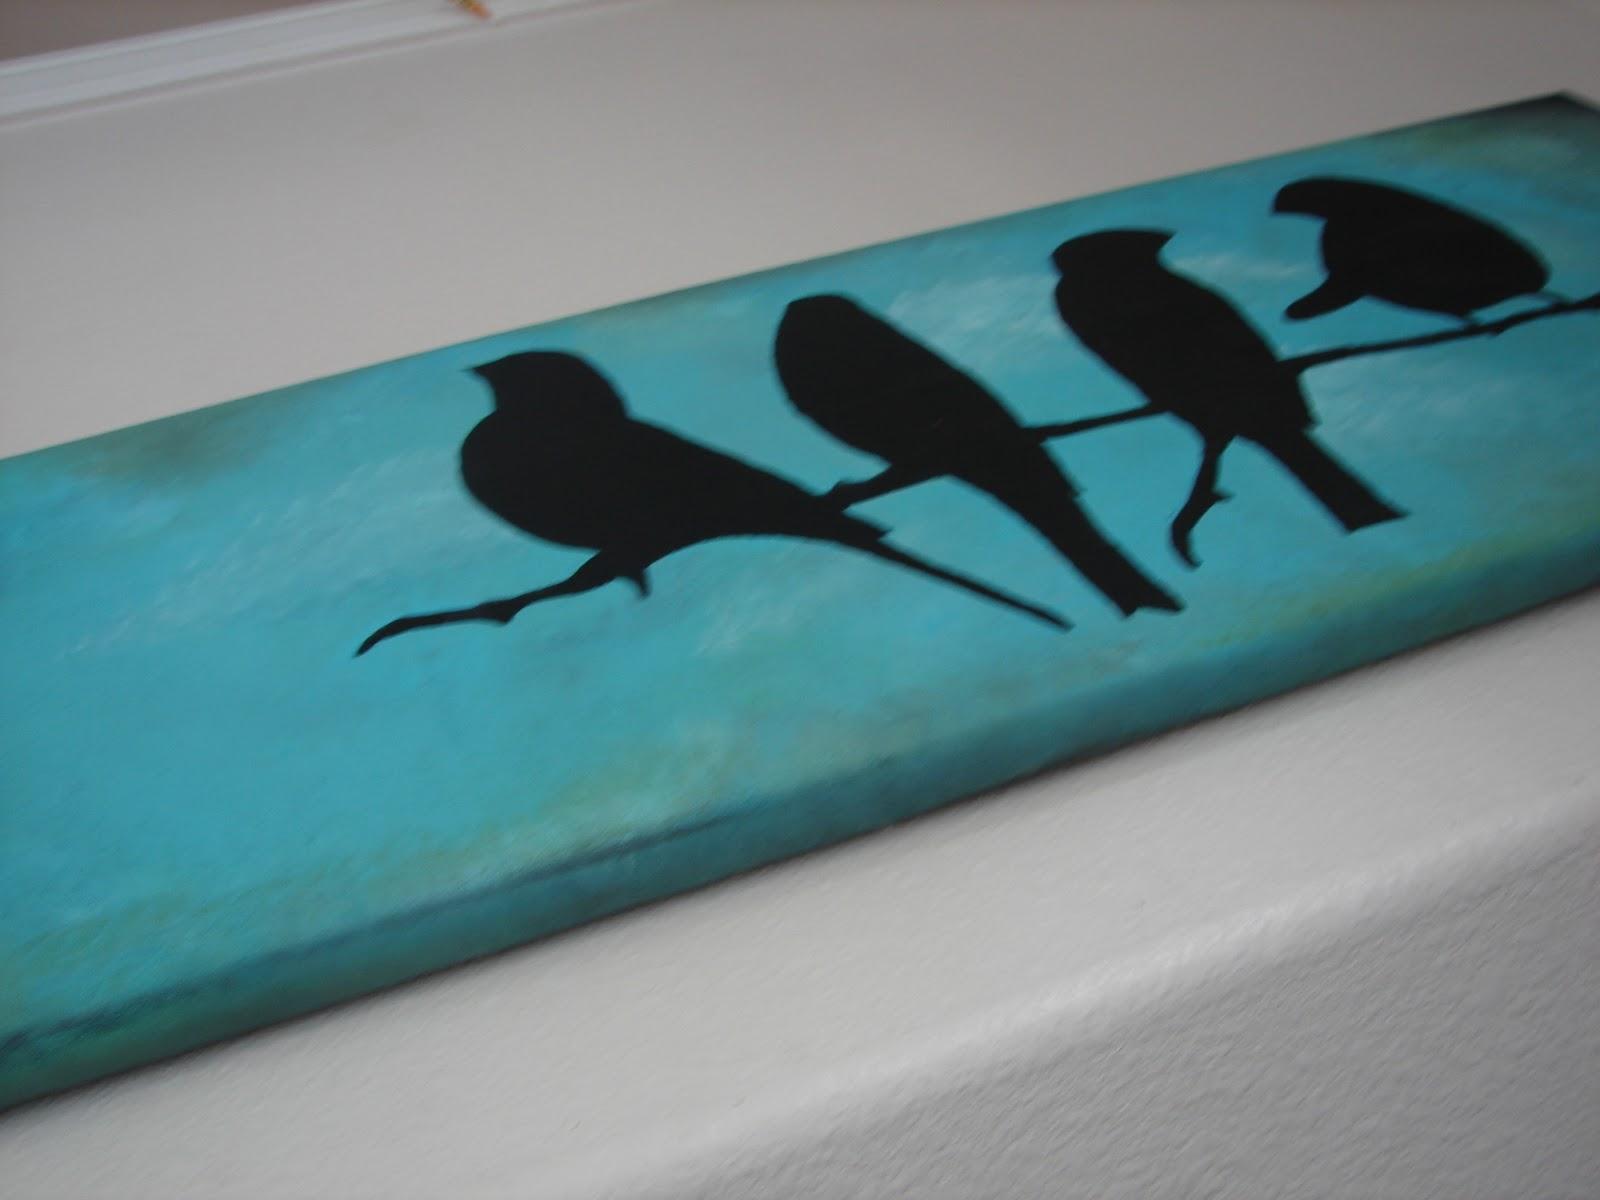 Blue Canvas Art Diy: A Girl And A Glue Gun: Diy Your Own Canvas